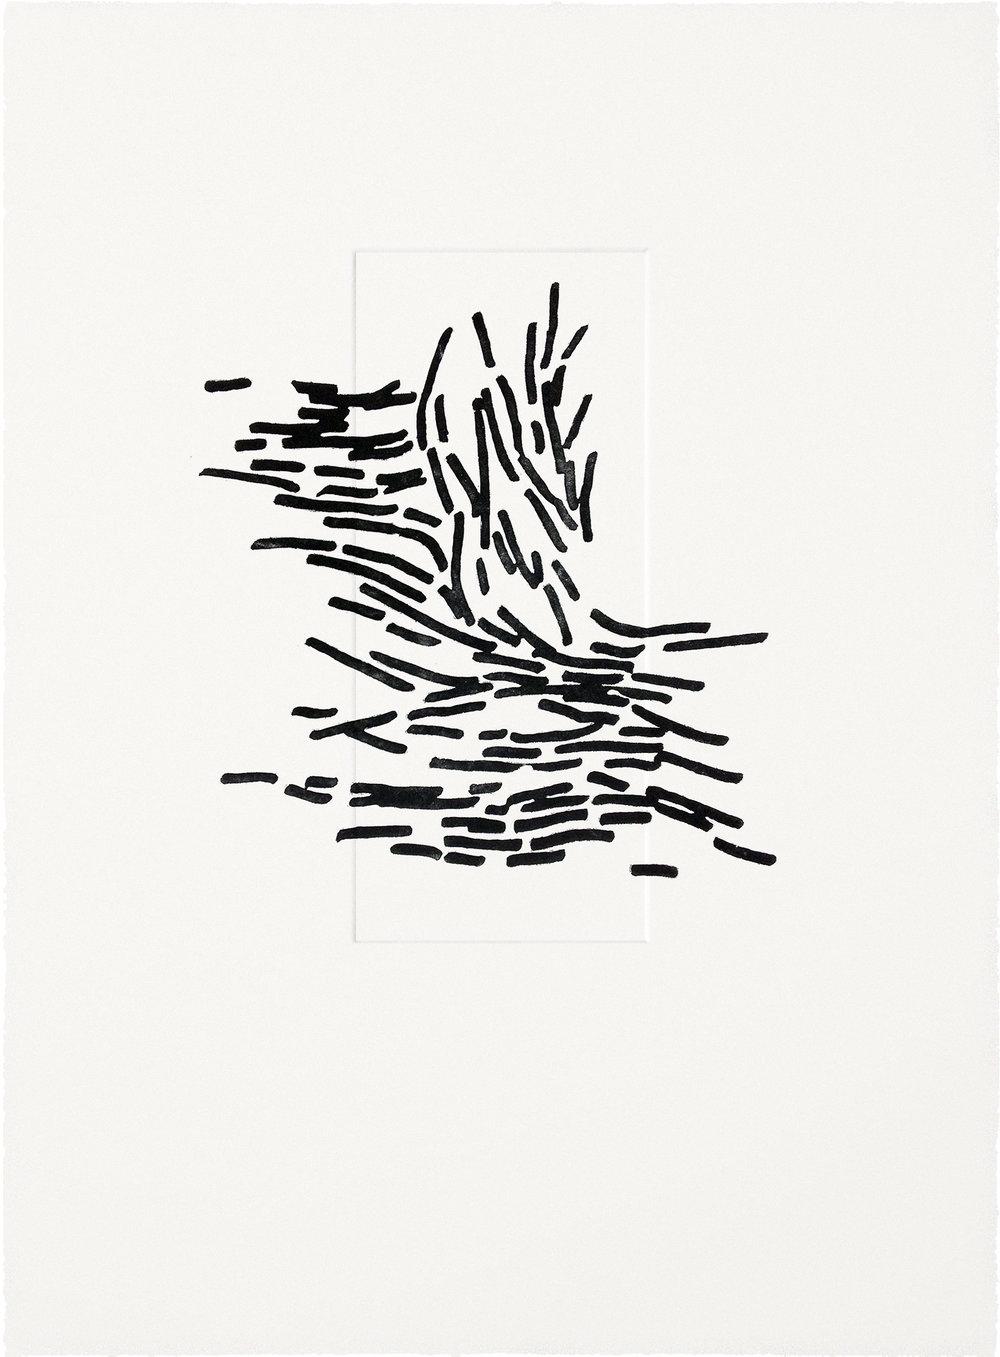 Eloquence, Diego Berjon